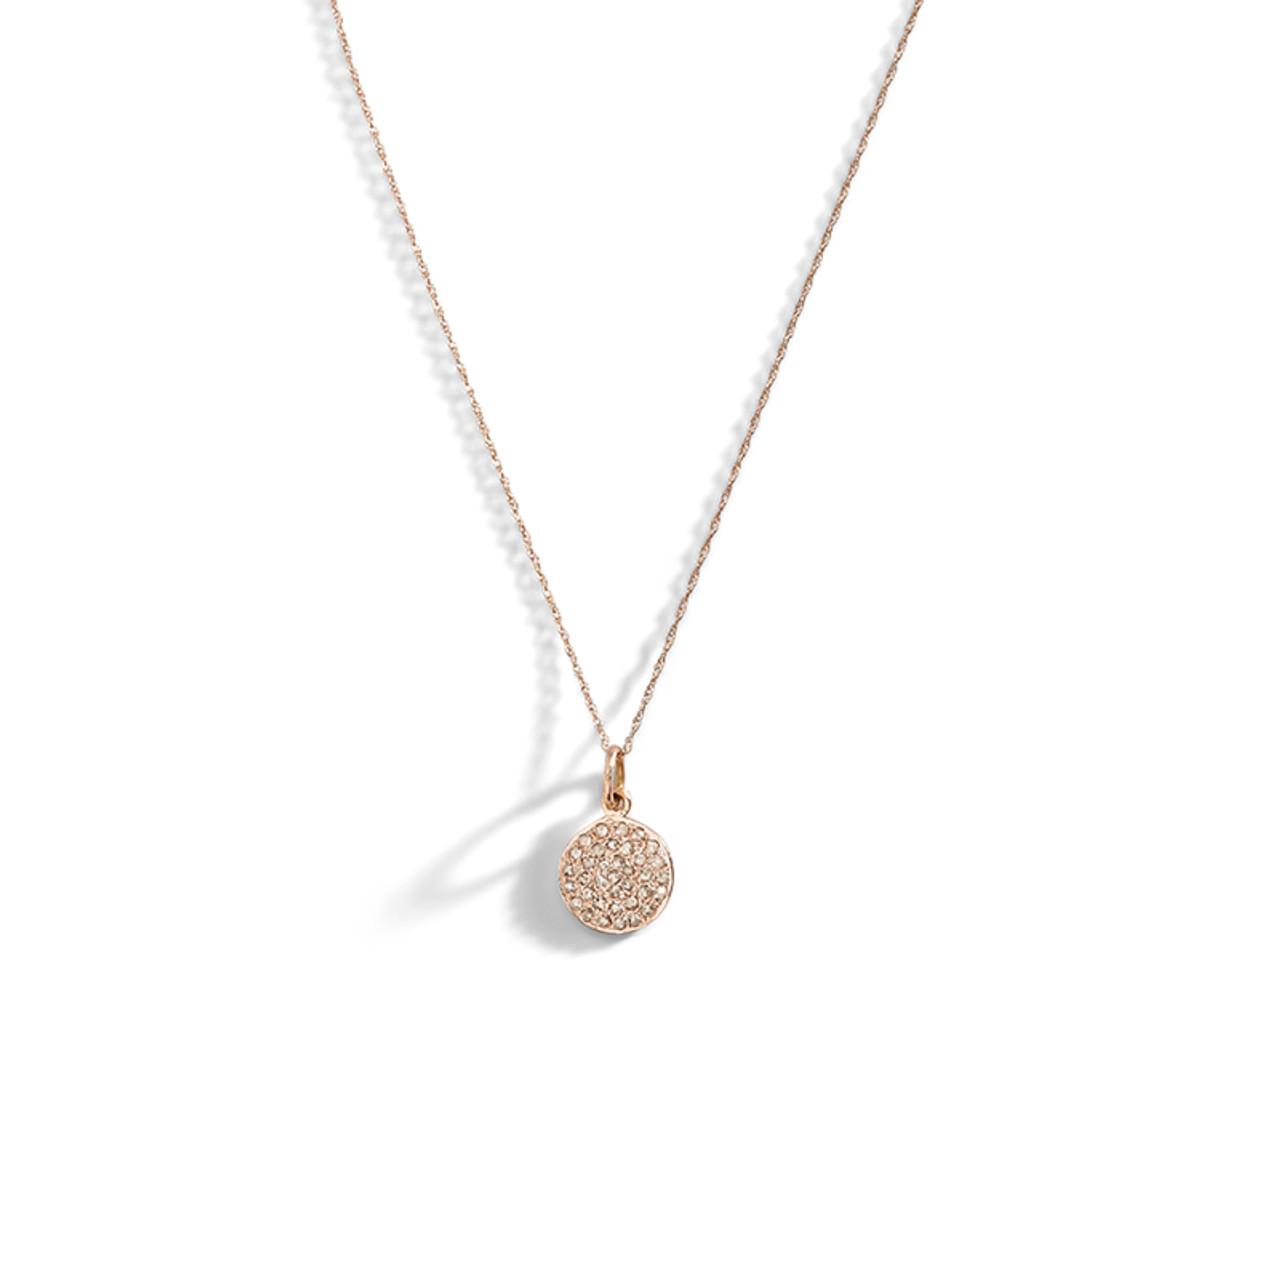 Minimalist Delicate Jewelry